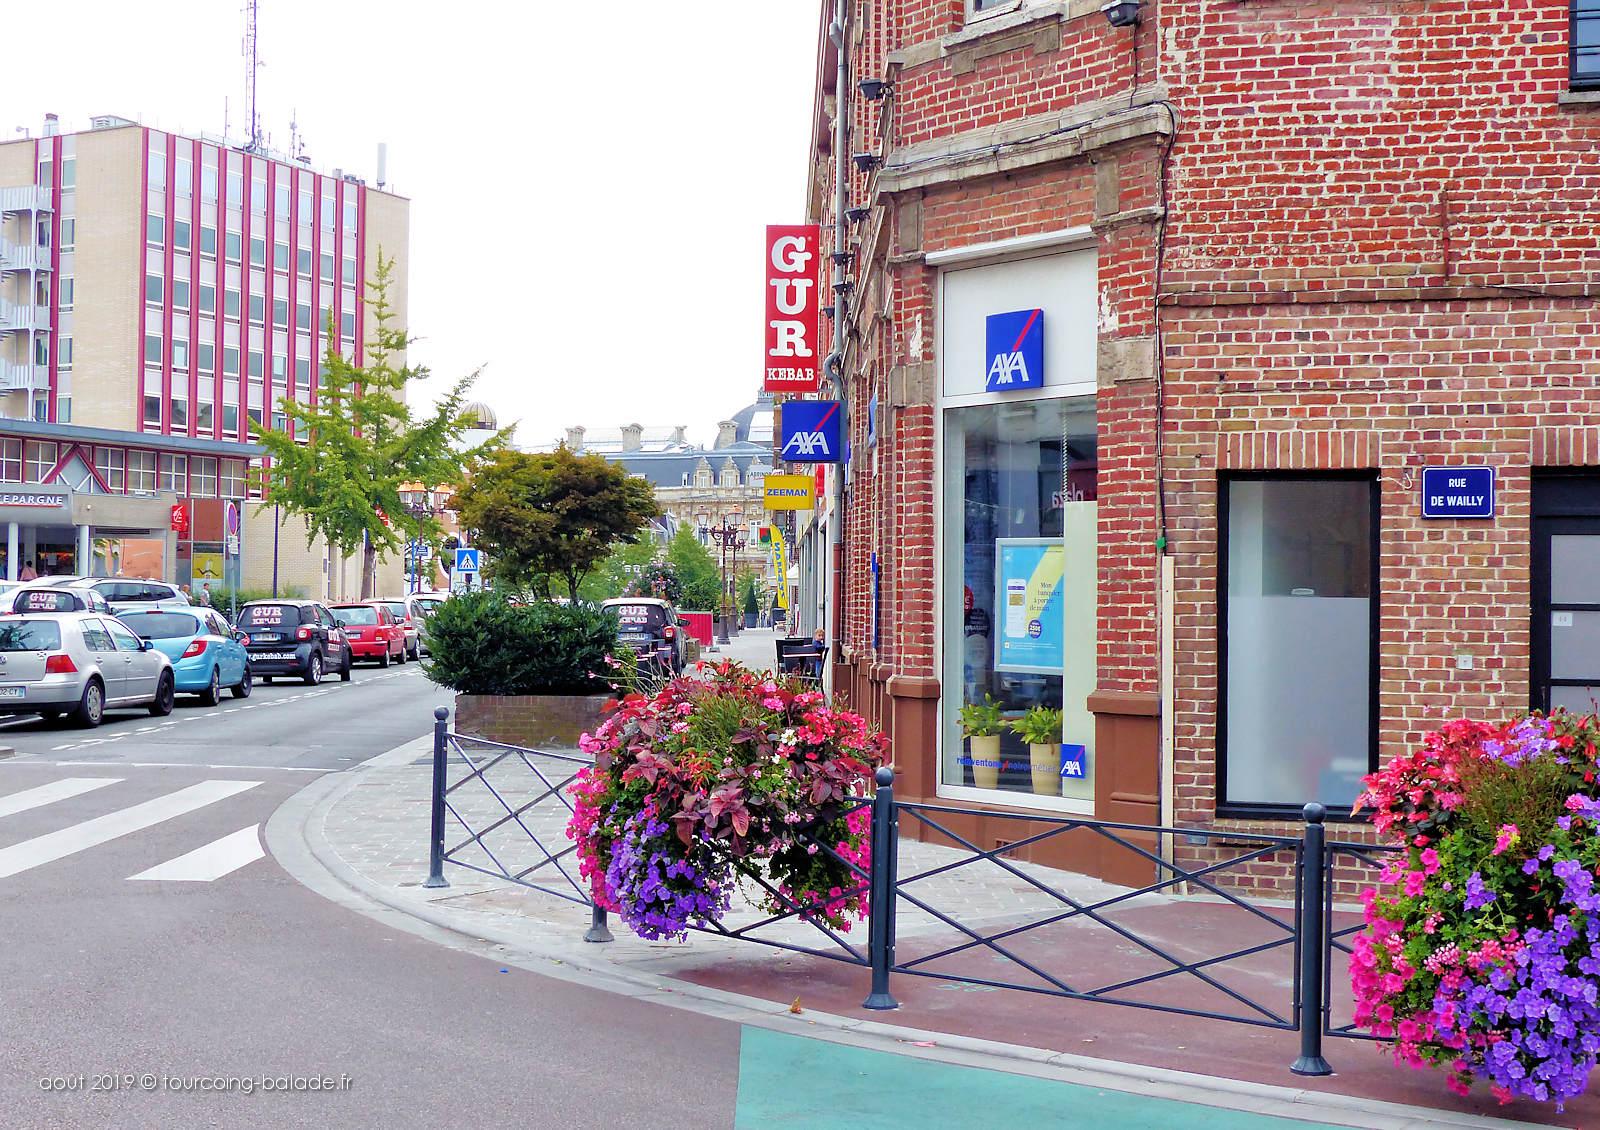 Tourcoing Centre - Angle Rue nationale et rue de Wailly